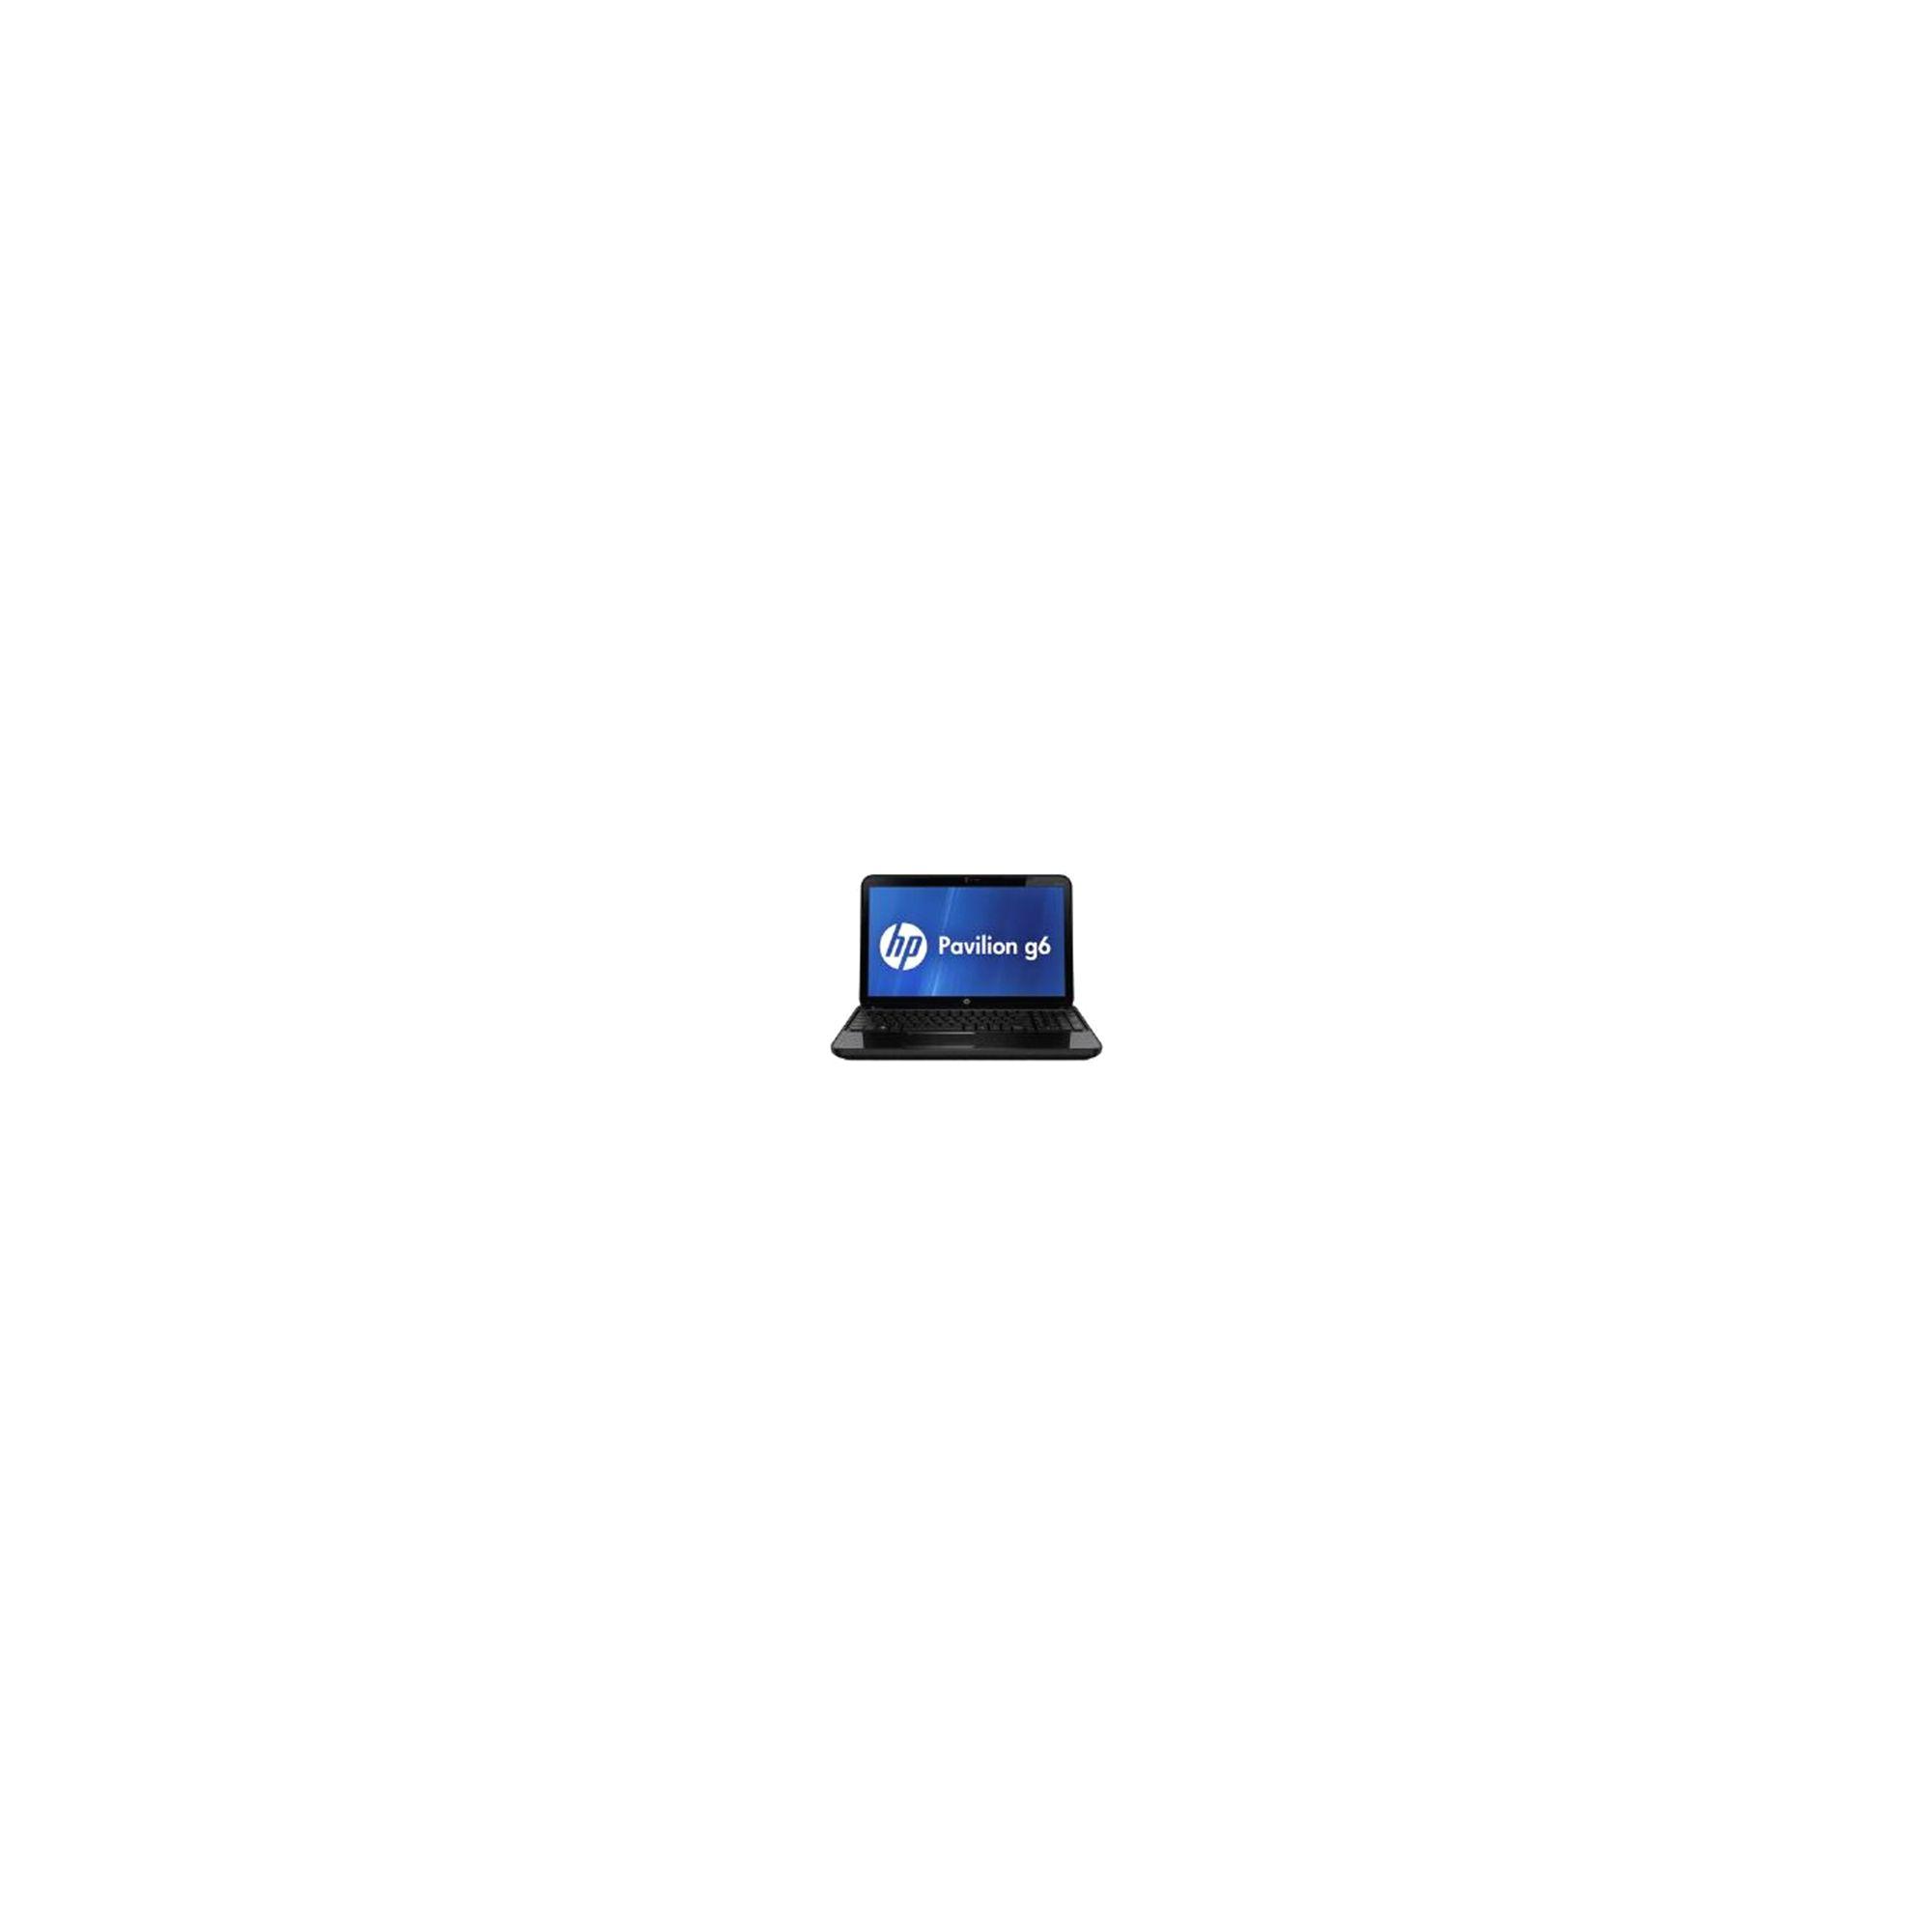 HP Pavilion g6-2252sa (15.6 inch) Notebook Core i5 (3210M) 2.5GHz 4GB 750GB DVD±RW SM DL WLAN Webcam Windows 8 (64-bit) HD Graphics 4000 (Black) at Tesco Direct